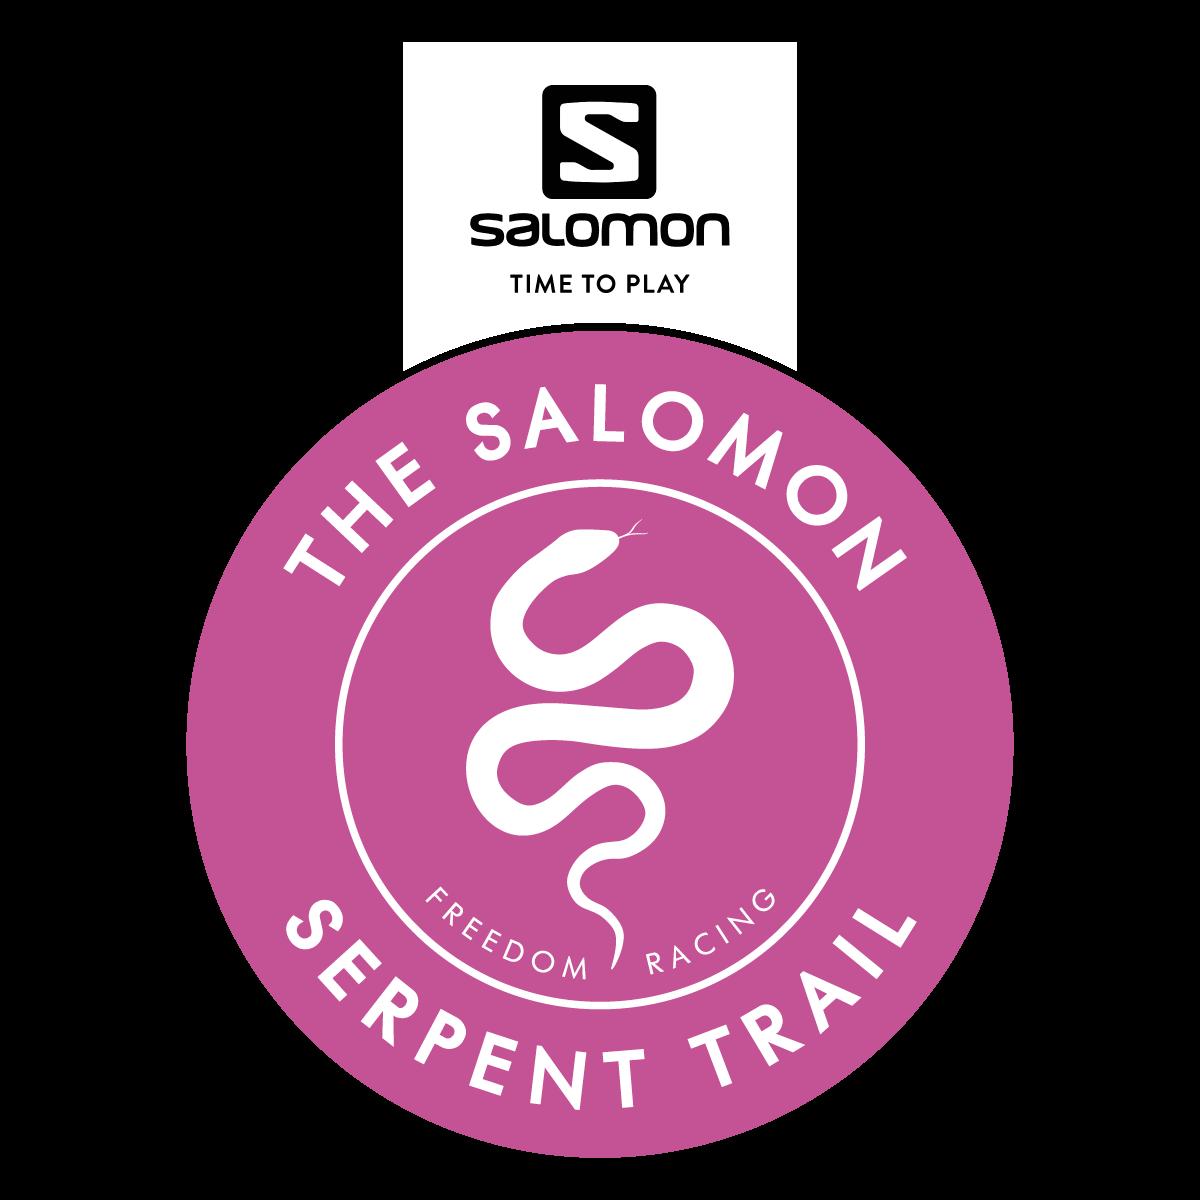 salomon-serpent-trail-main-white